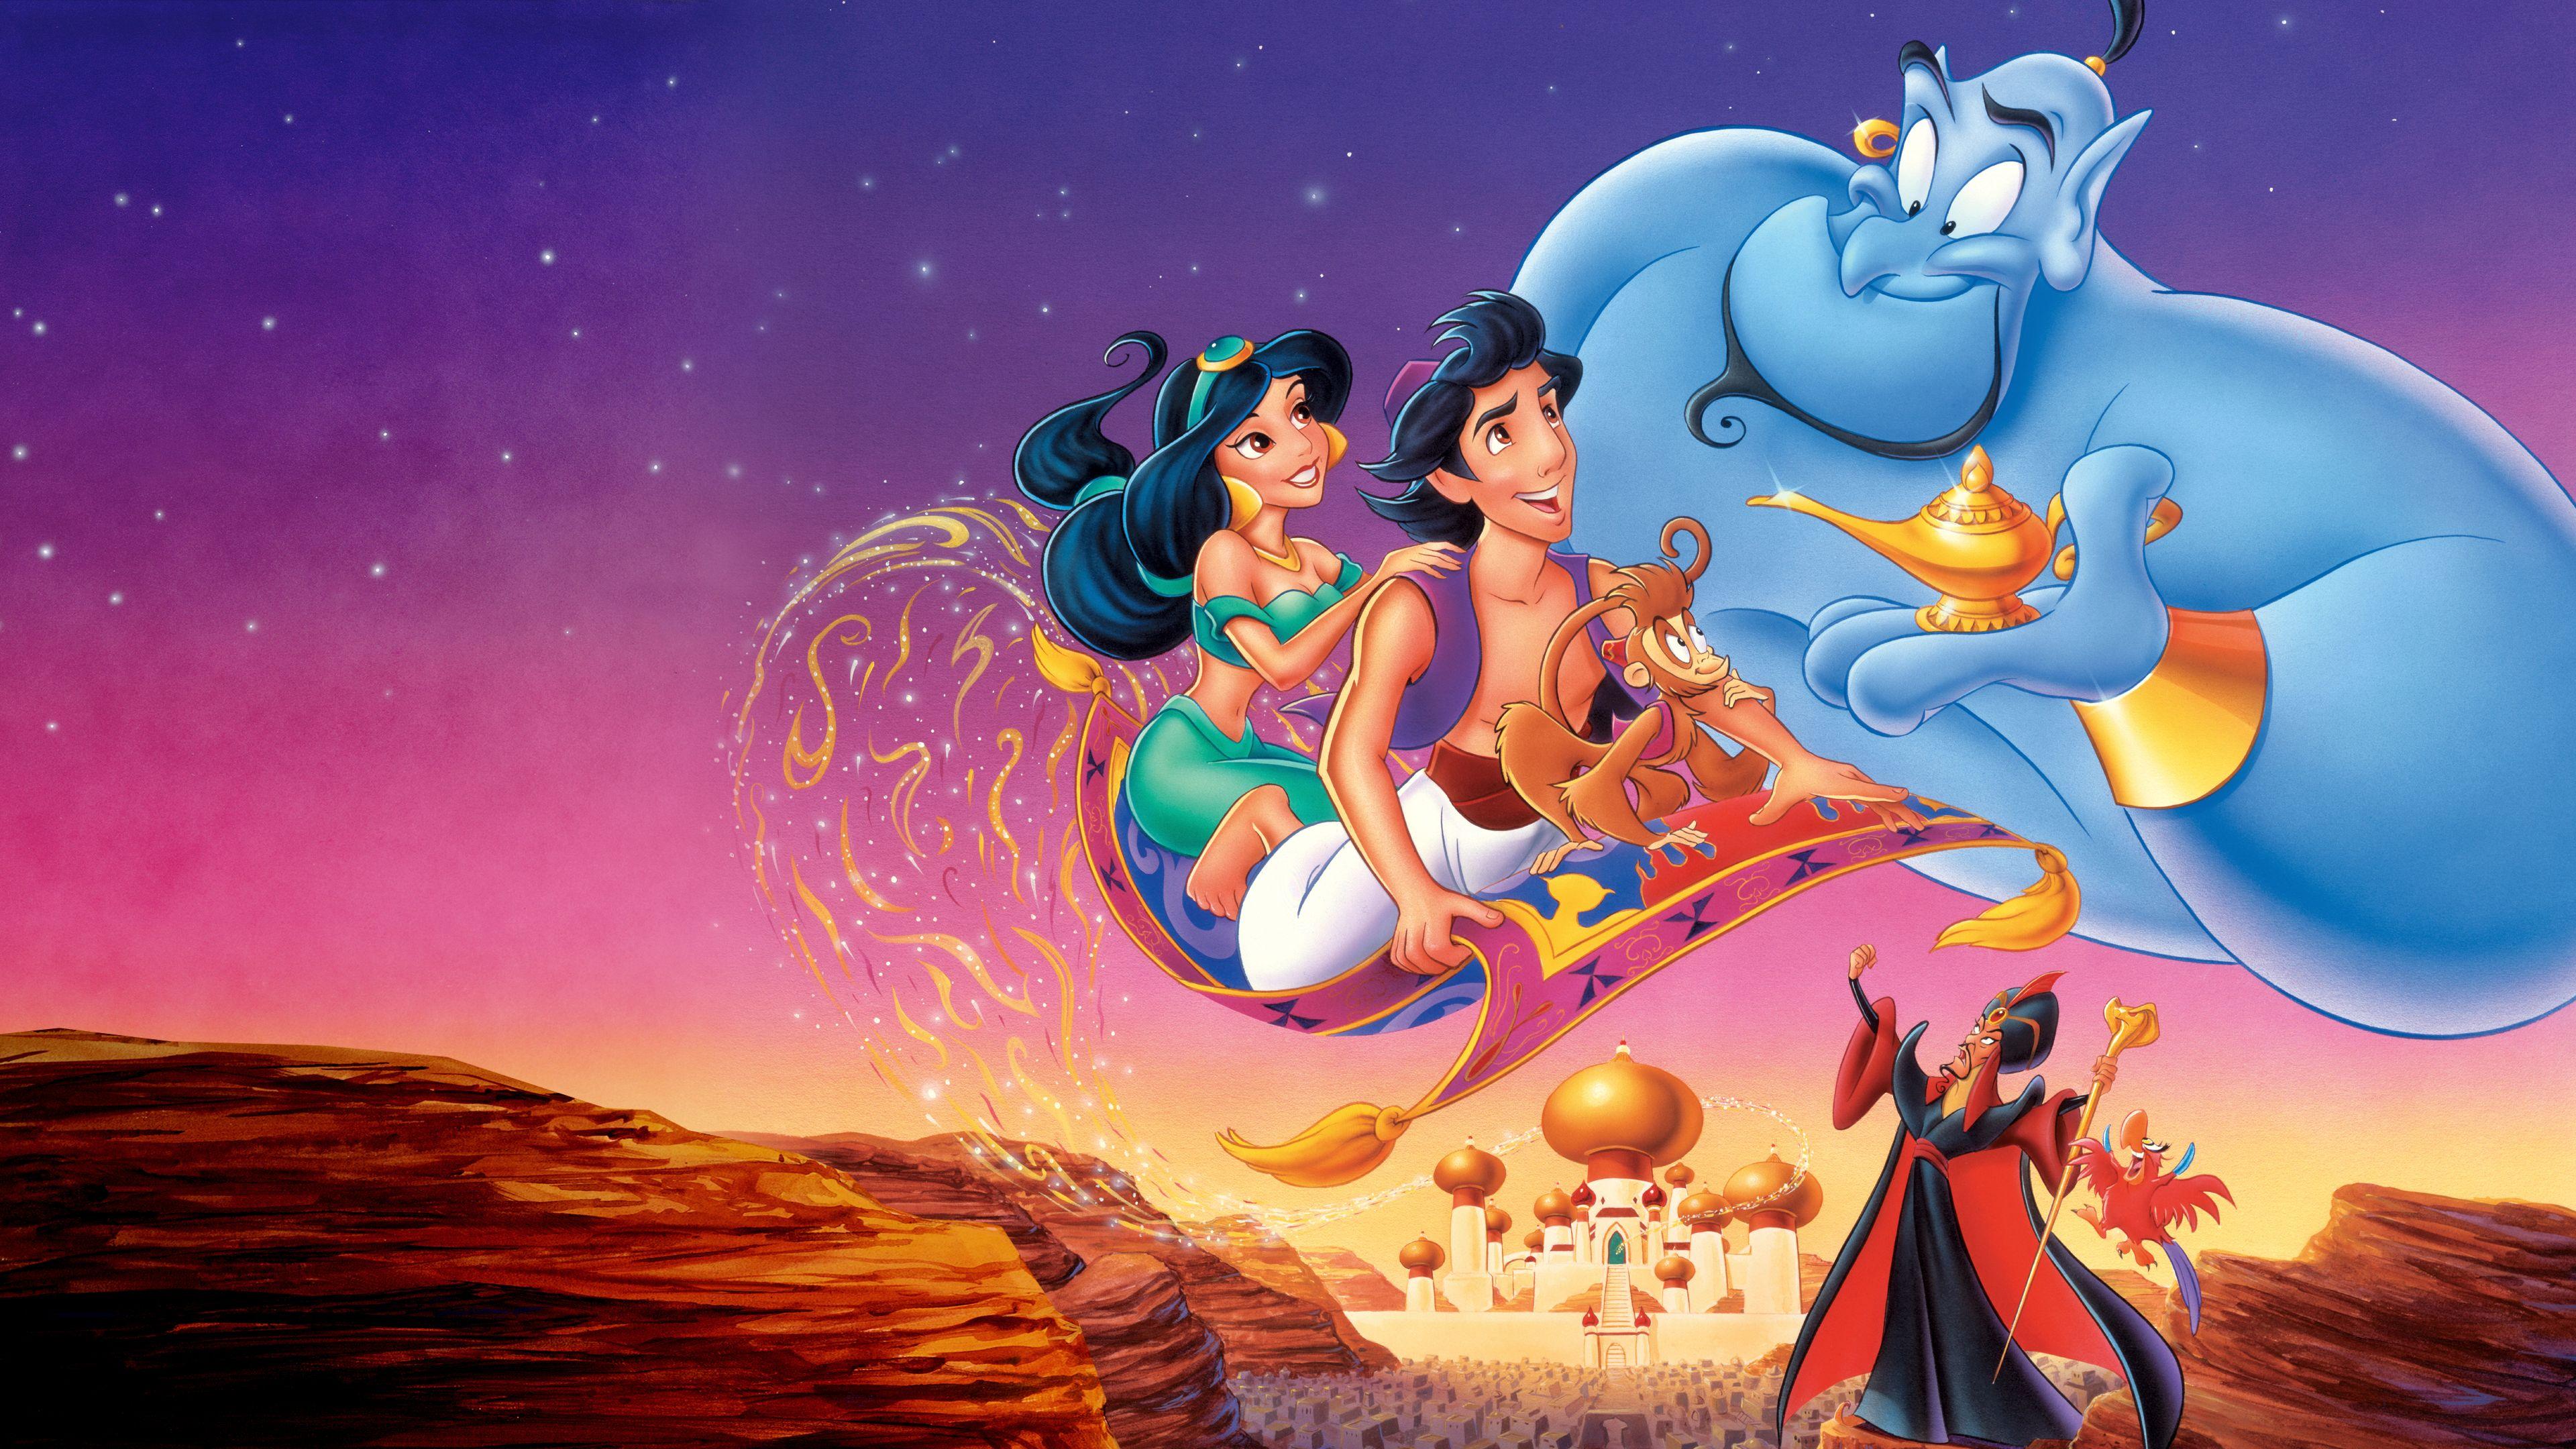 Animation Cartoon Full Movie watch aladdin (1992)   full movie   disney+